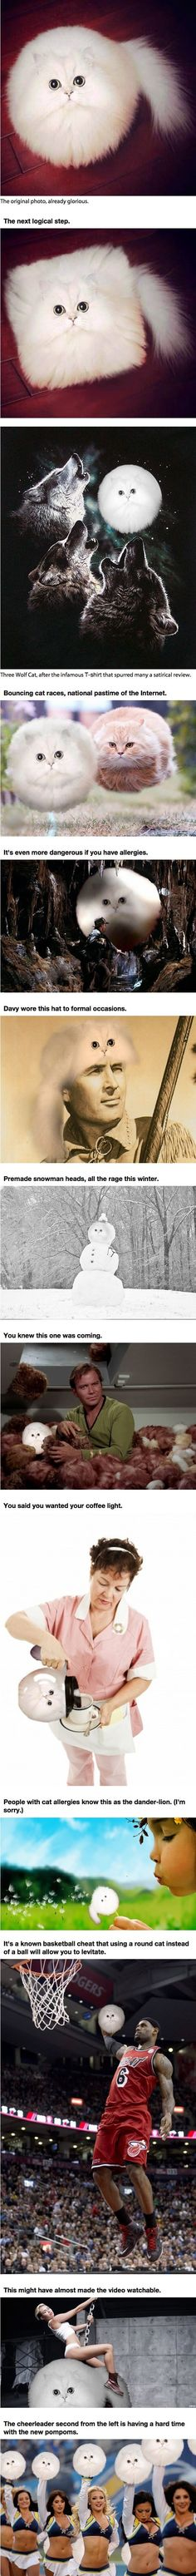 Hilarious photo edits